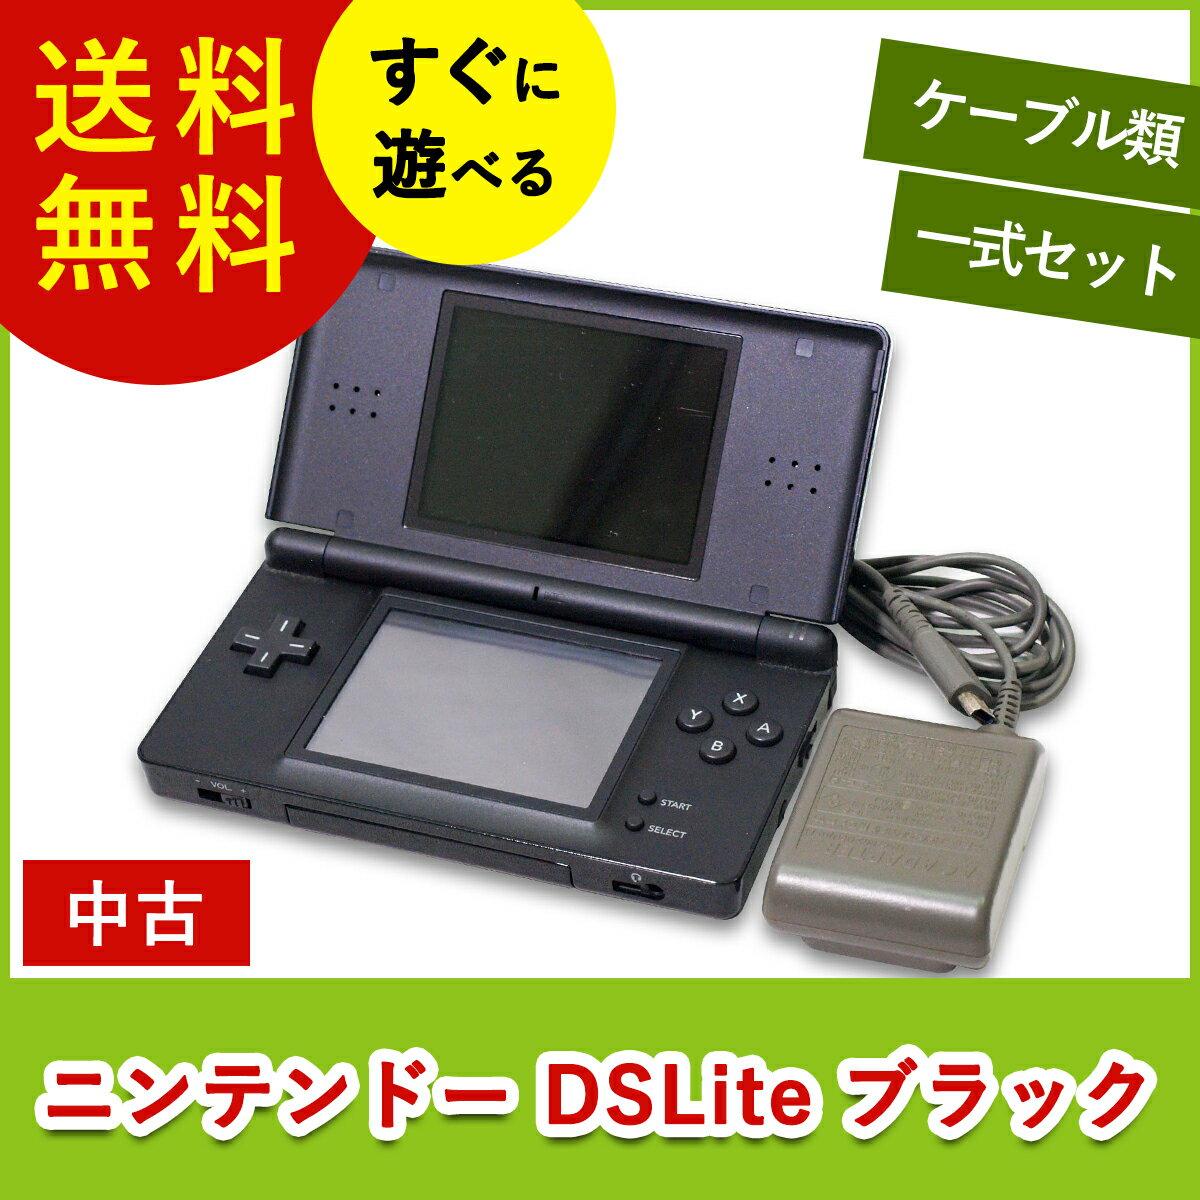 DSライト DSLite 本体 ブラック ニンテンドー 任天堂 Nintendo 中古 充電器&タッチペン付き すぐ遊べるセット 4902370513929 送料無料 【中古】